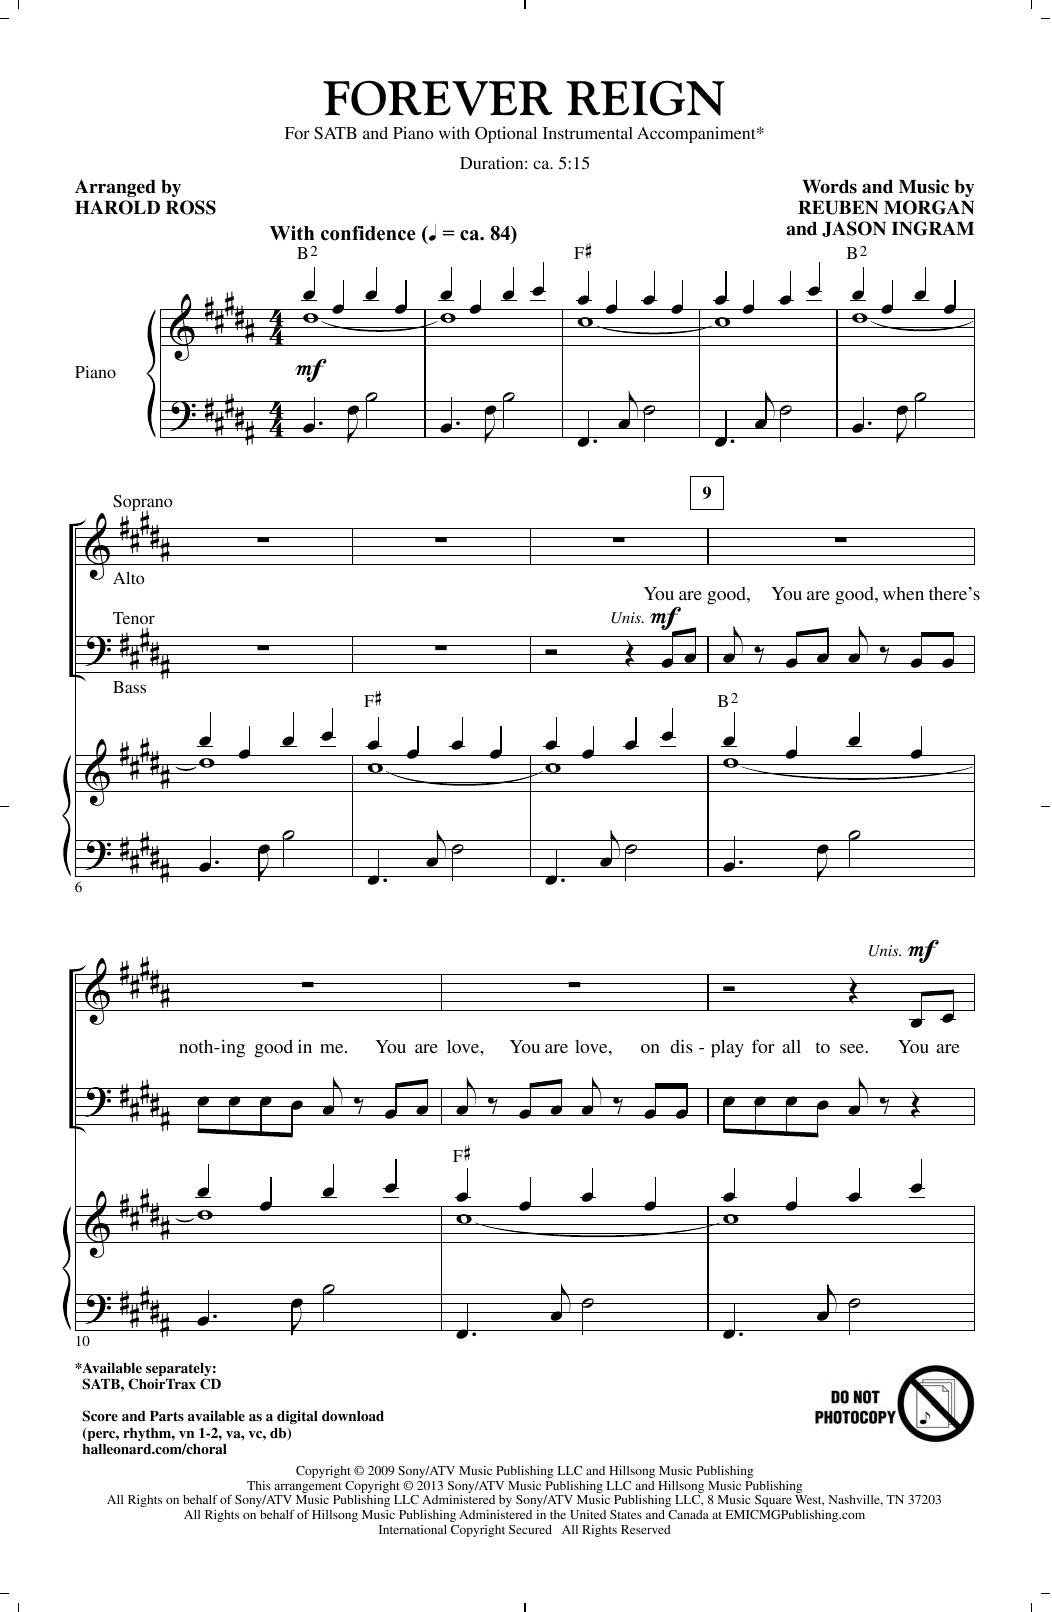 Harold Ross Forever Reign Sheet Music Notes, Chords   Download Printable  SATB Choir PDF Score   SKU 15